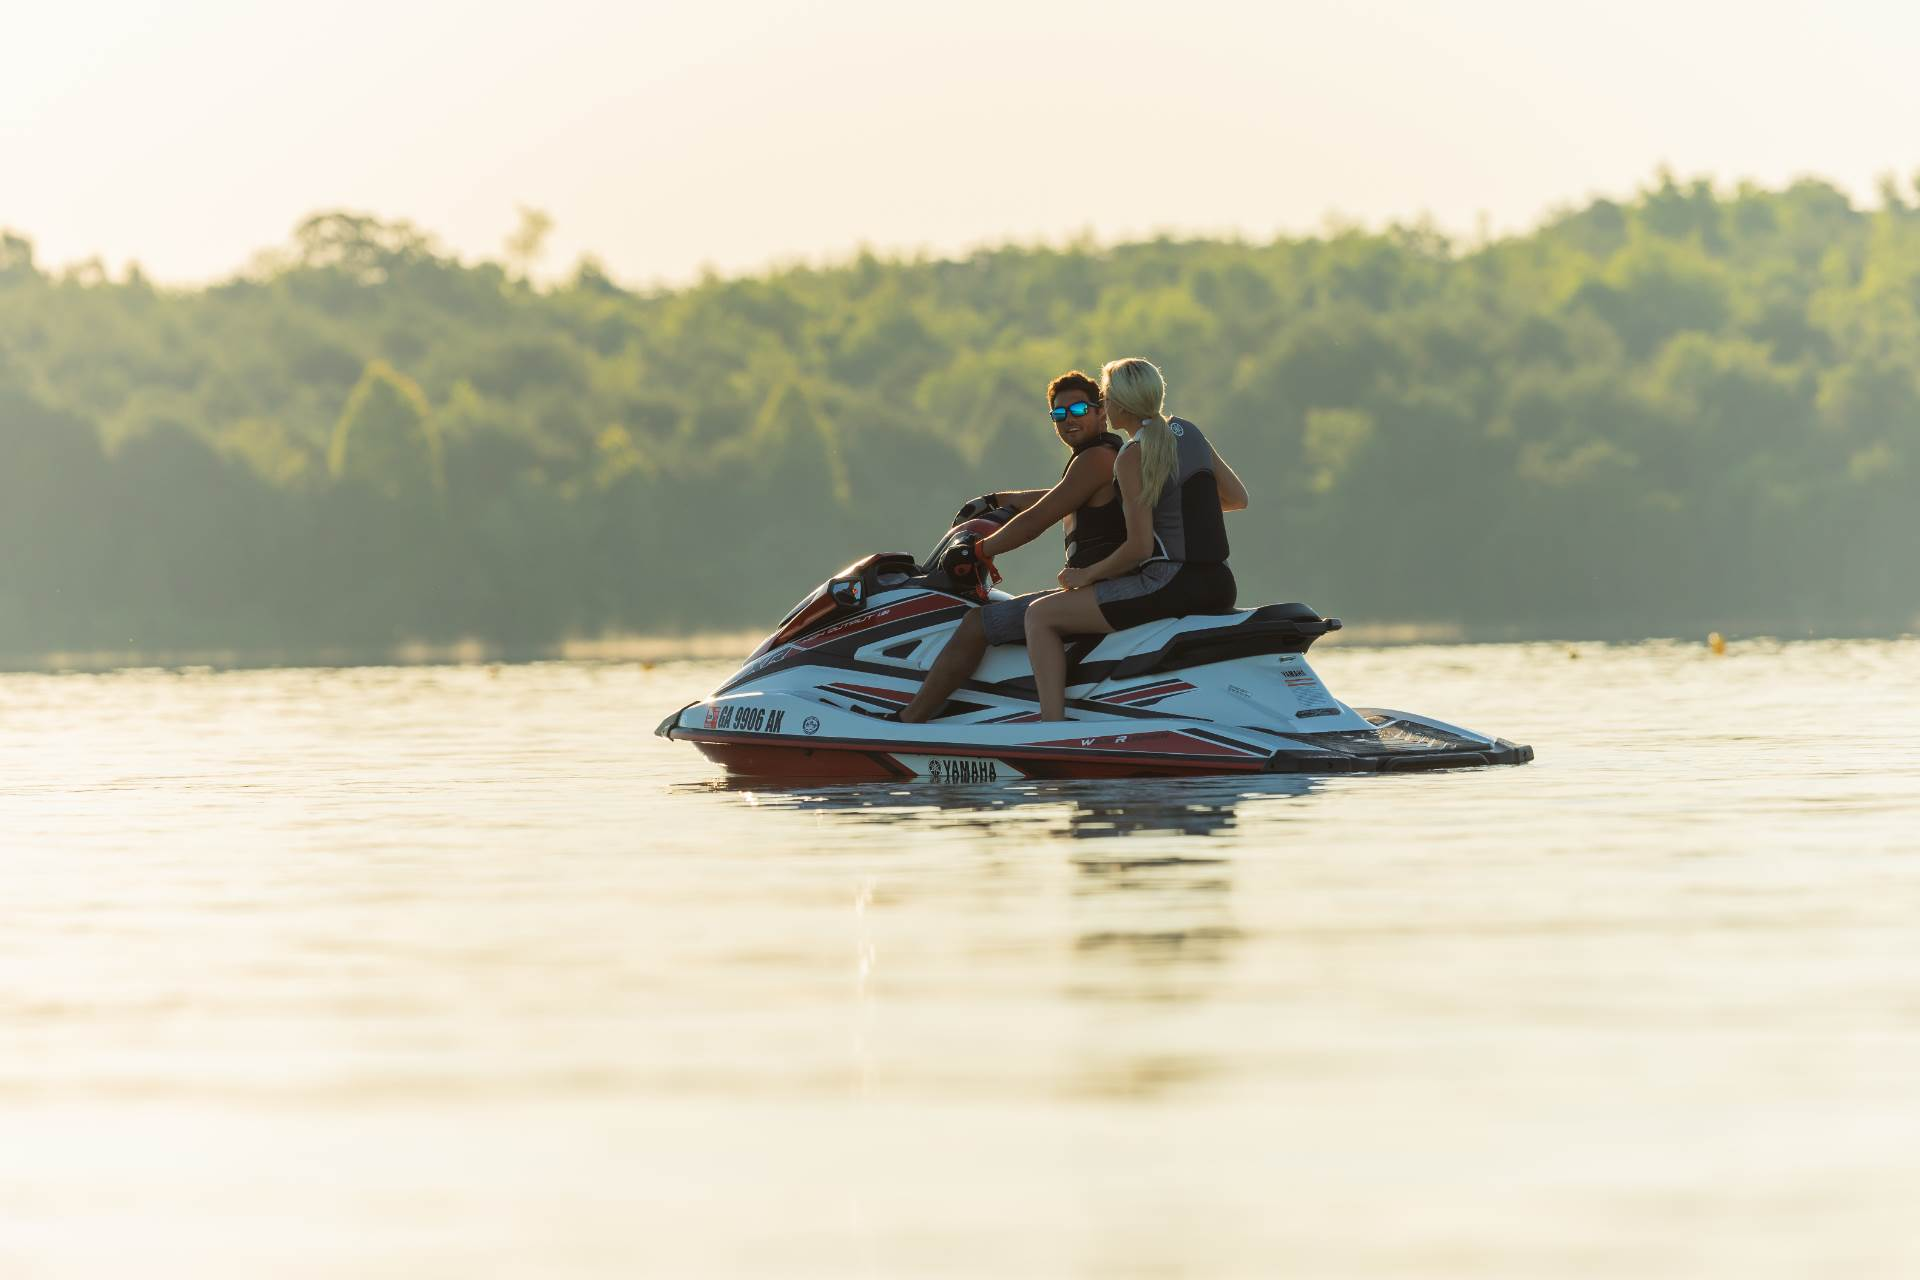 2019 Yamaha VXR in Clearwater, Florida